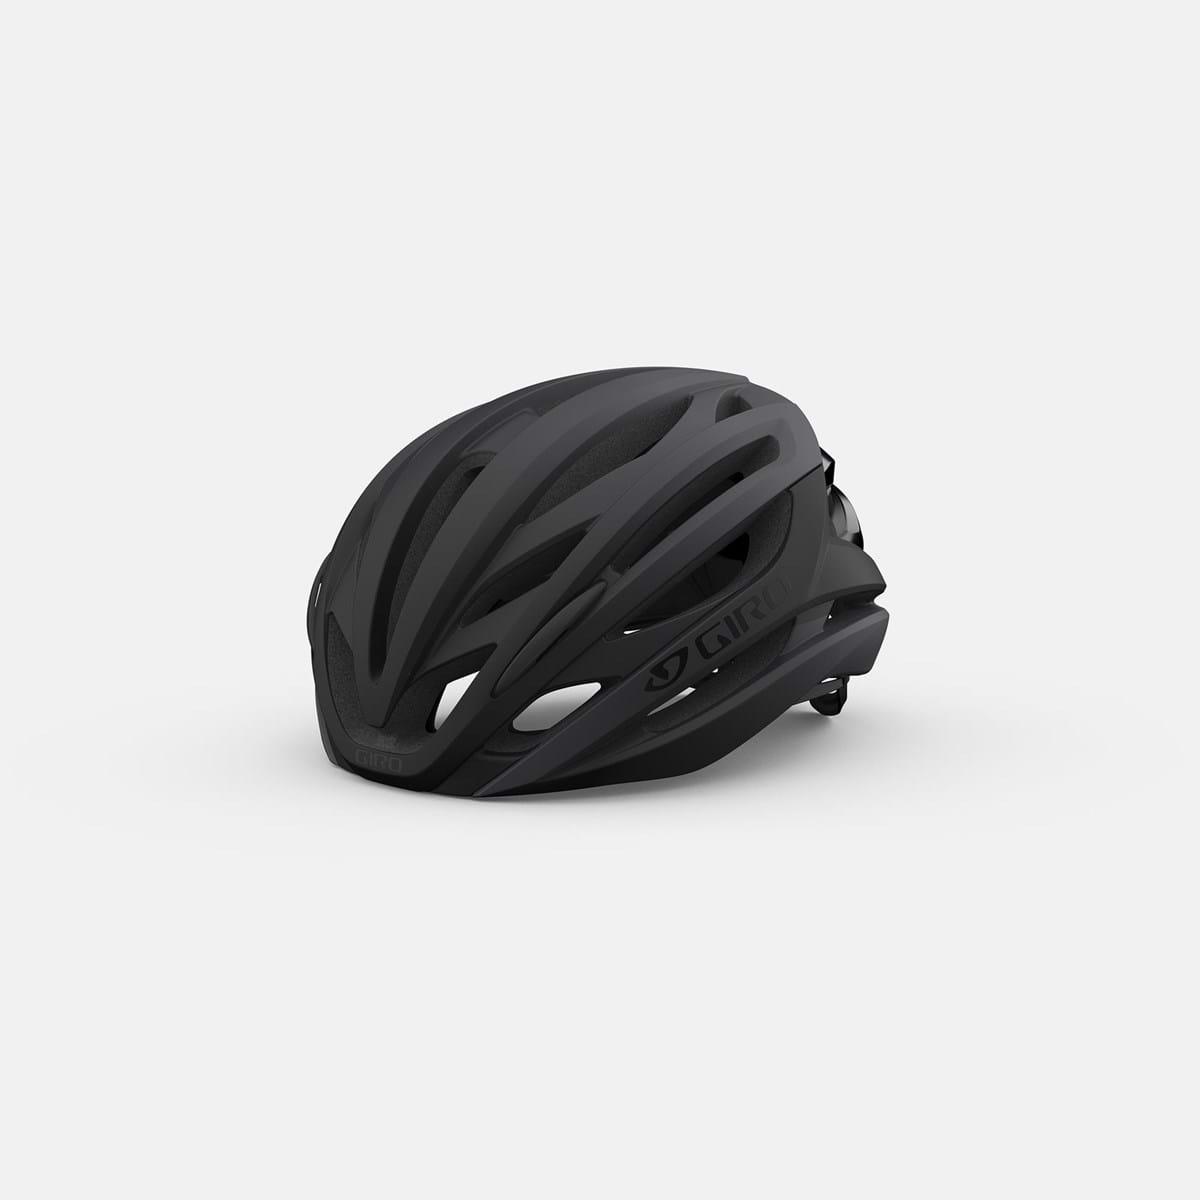 Syntax Road Helmet